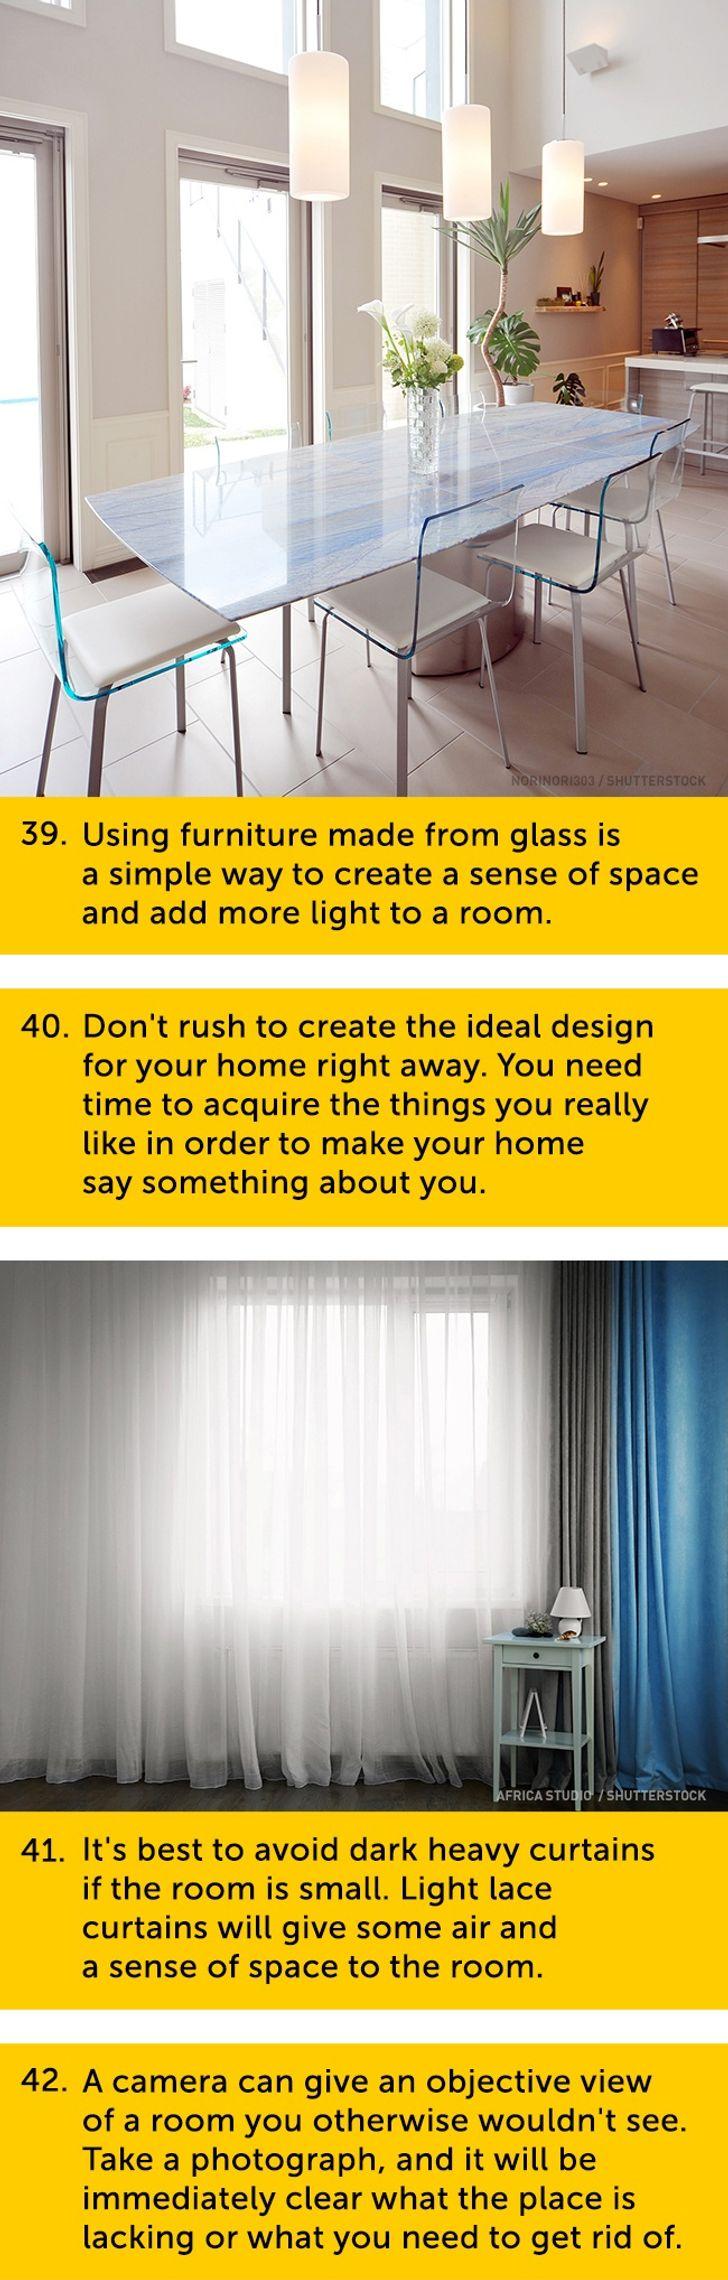 101 Superb Pieces ofInterior Design Advice